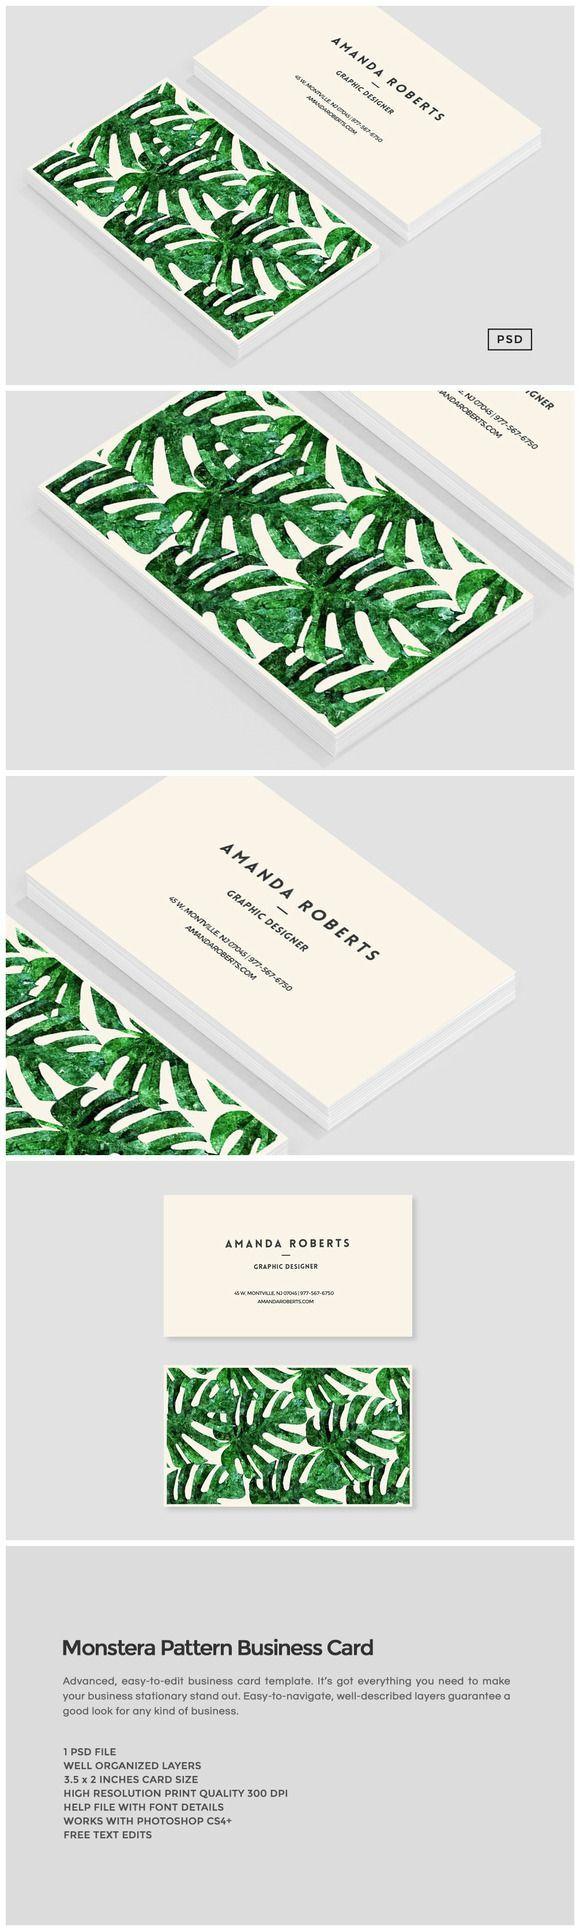 Business Card design ideas   Green foliage   Monstera Pattern ...